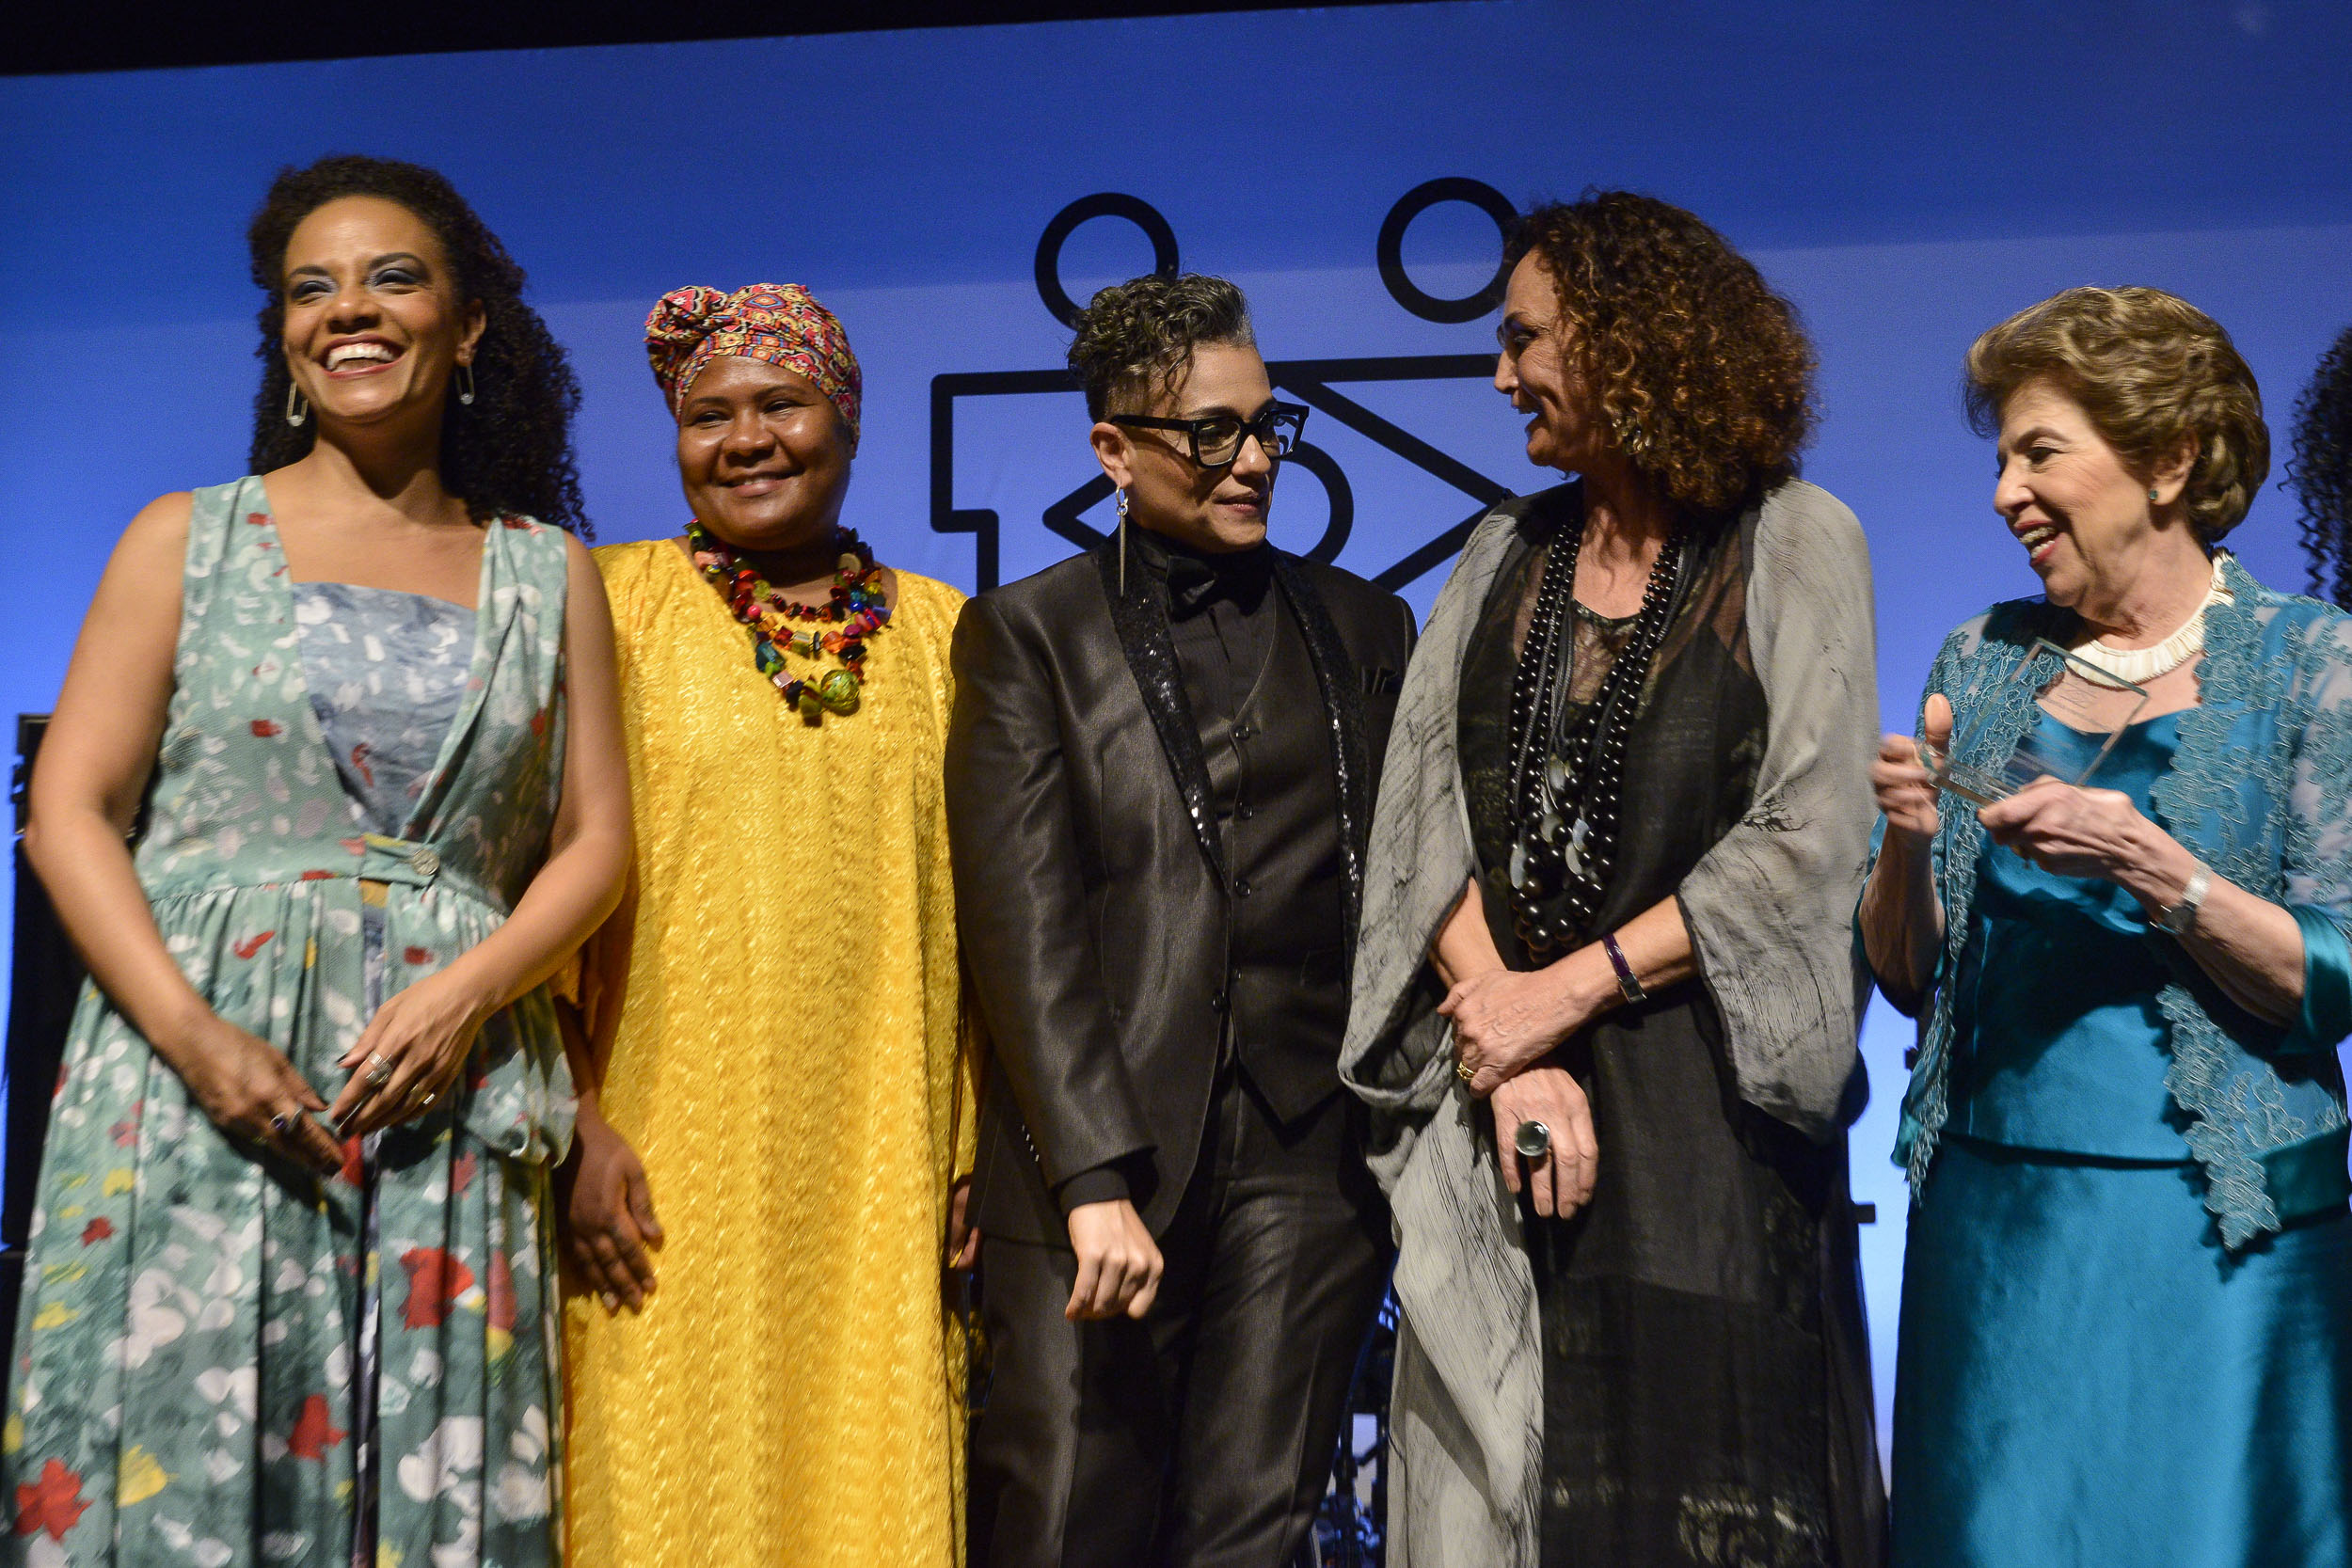 Flávia Oliveira, Charô Nunes, Pri Bertucci, Elena Landau, Mary Allegretti BrazilFoundation Gala São Paulo Mulheres Notáveis Women Philanthropy Filantropia